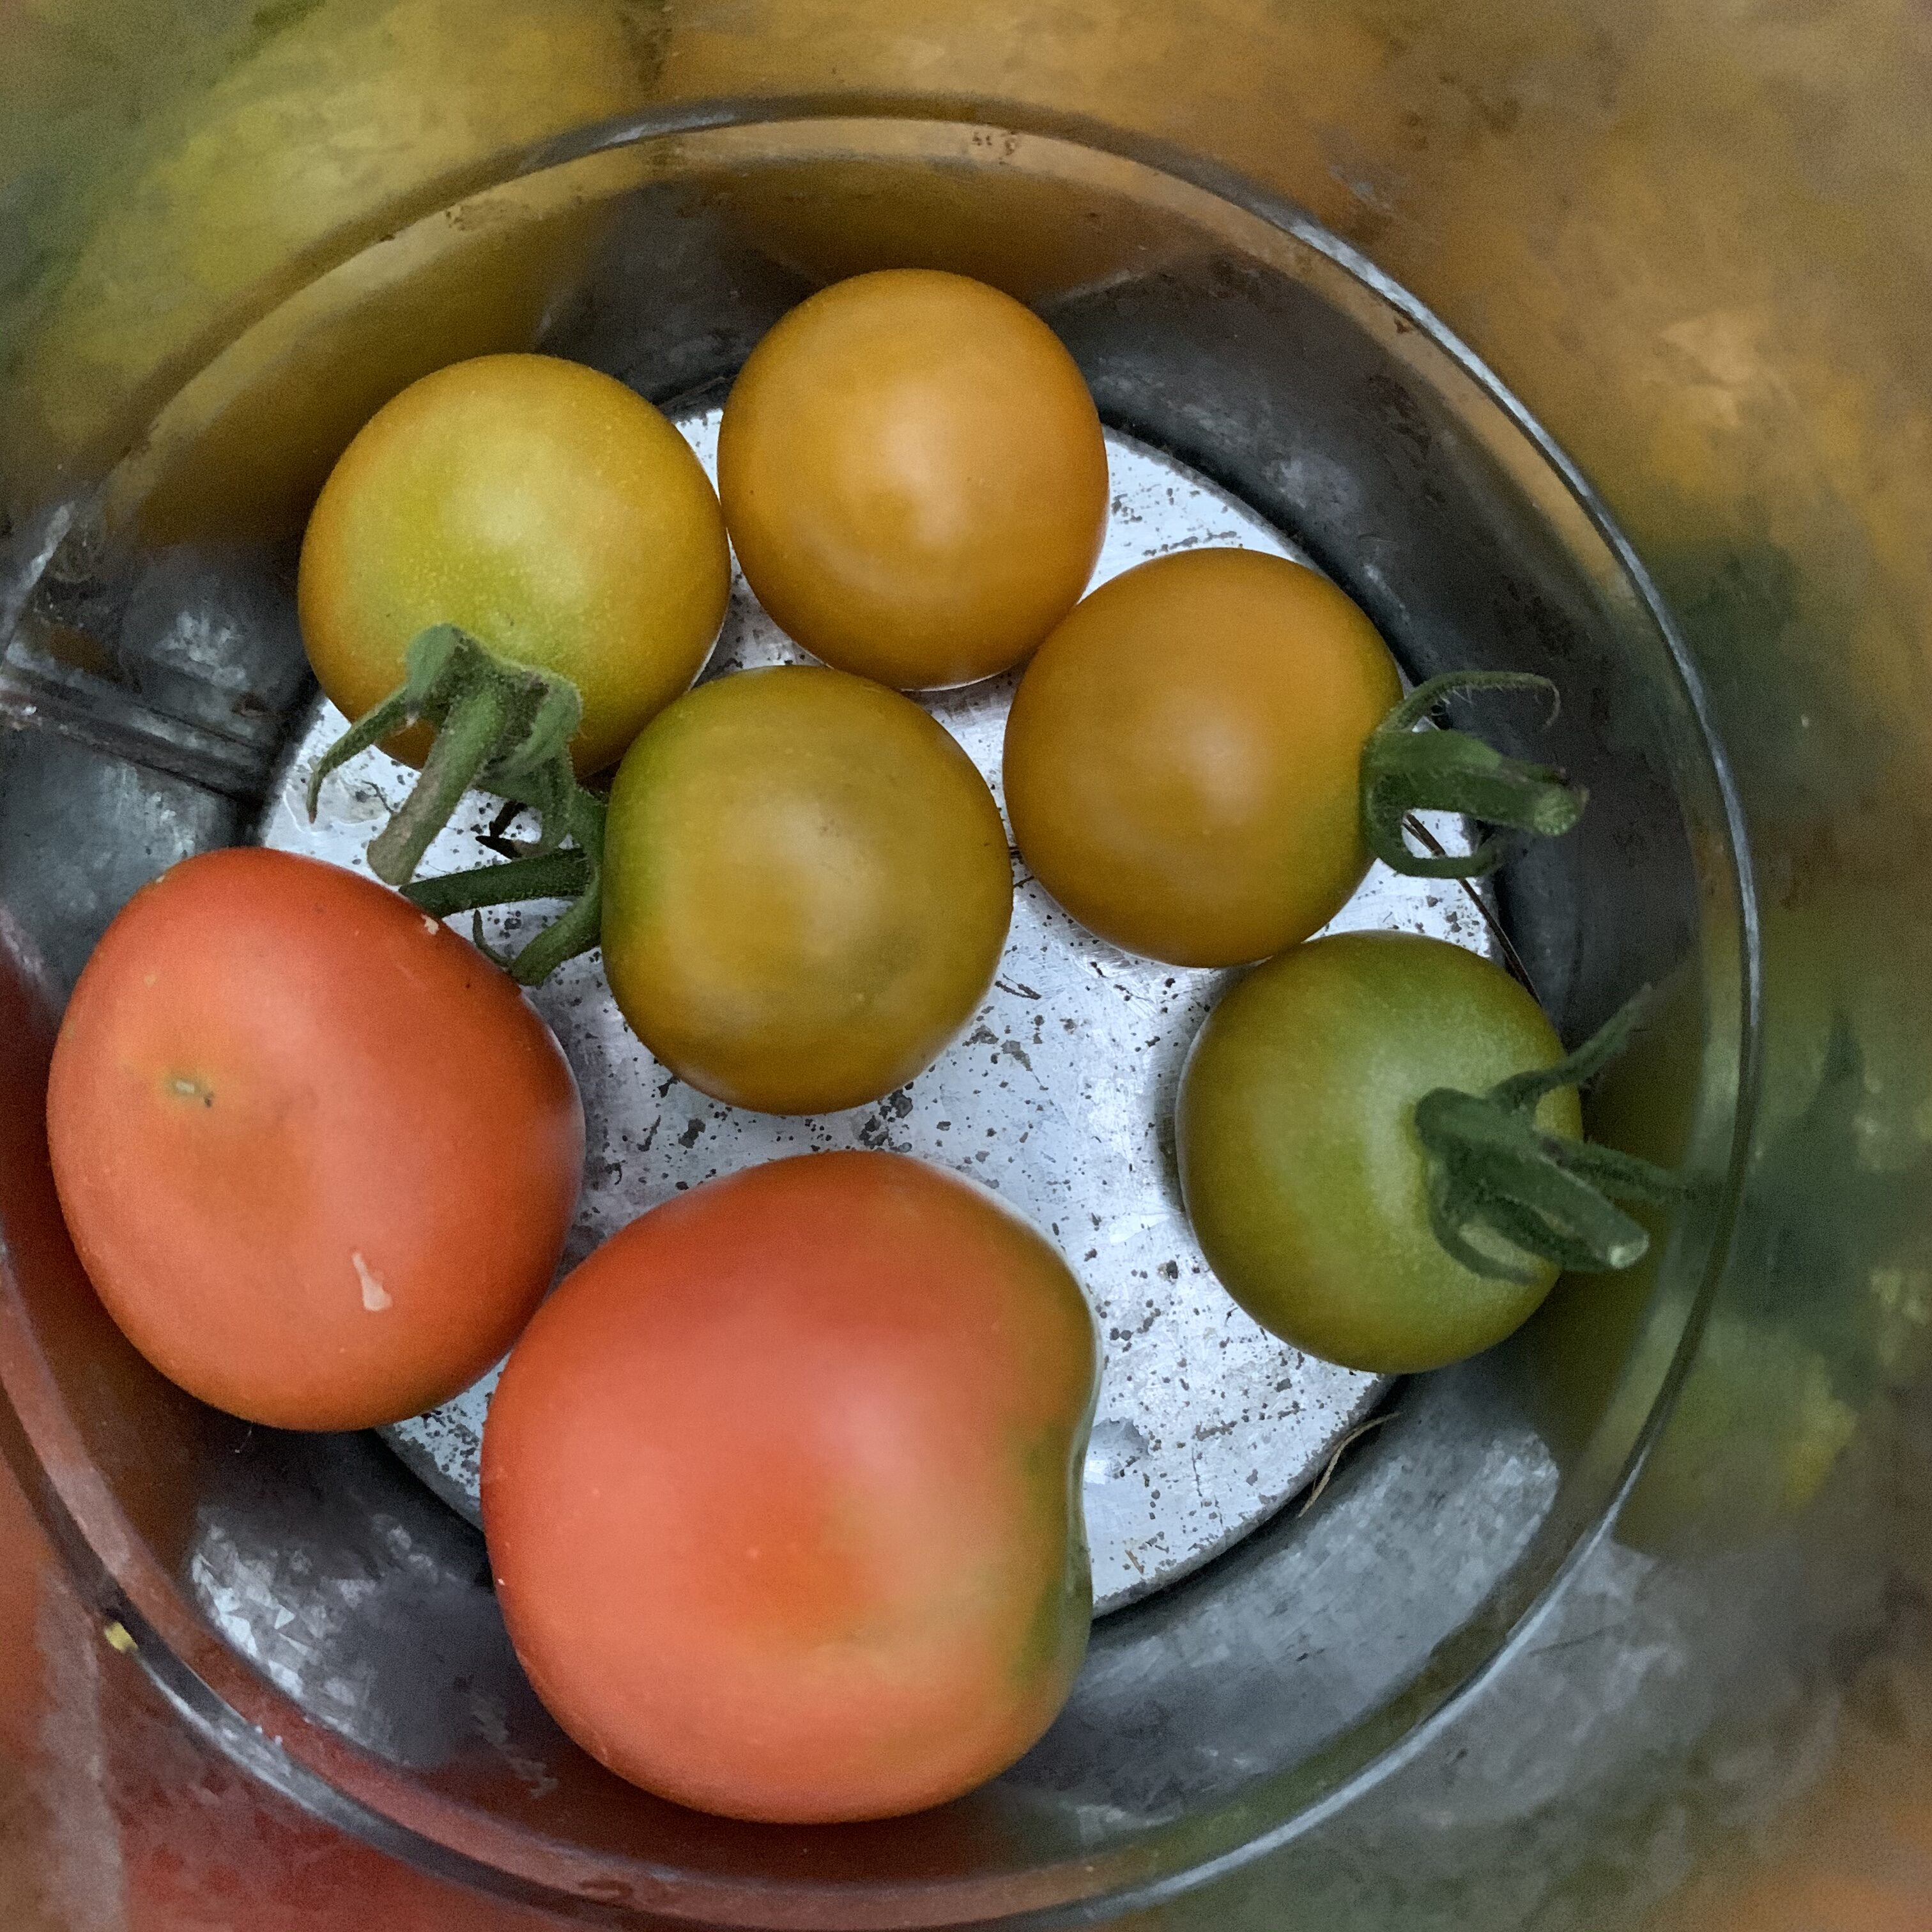 7C6C1F55 63F3 4DF0 8165 C71DCB26832F Fourth of July Tomato!